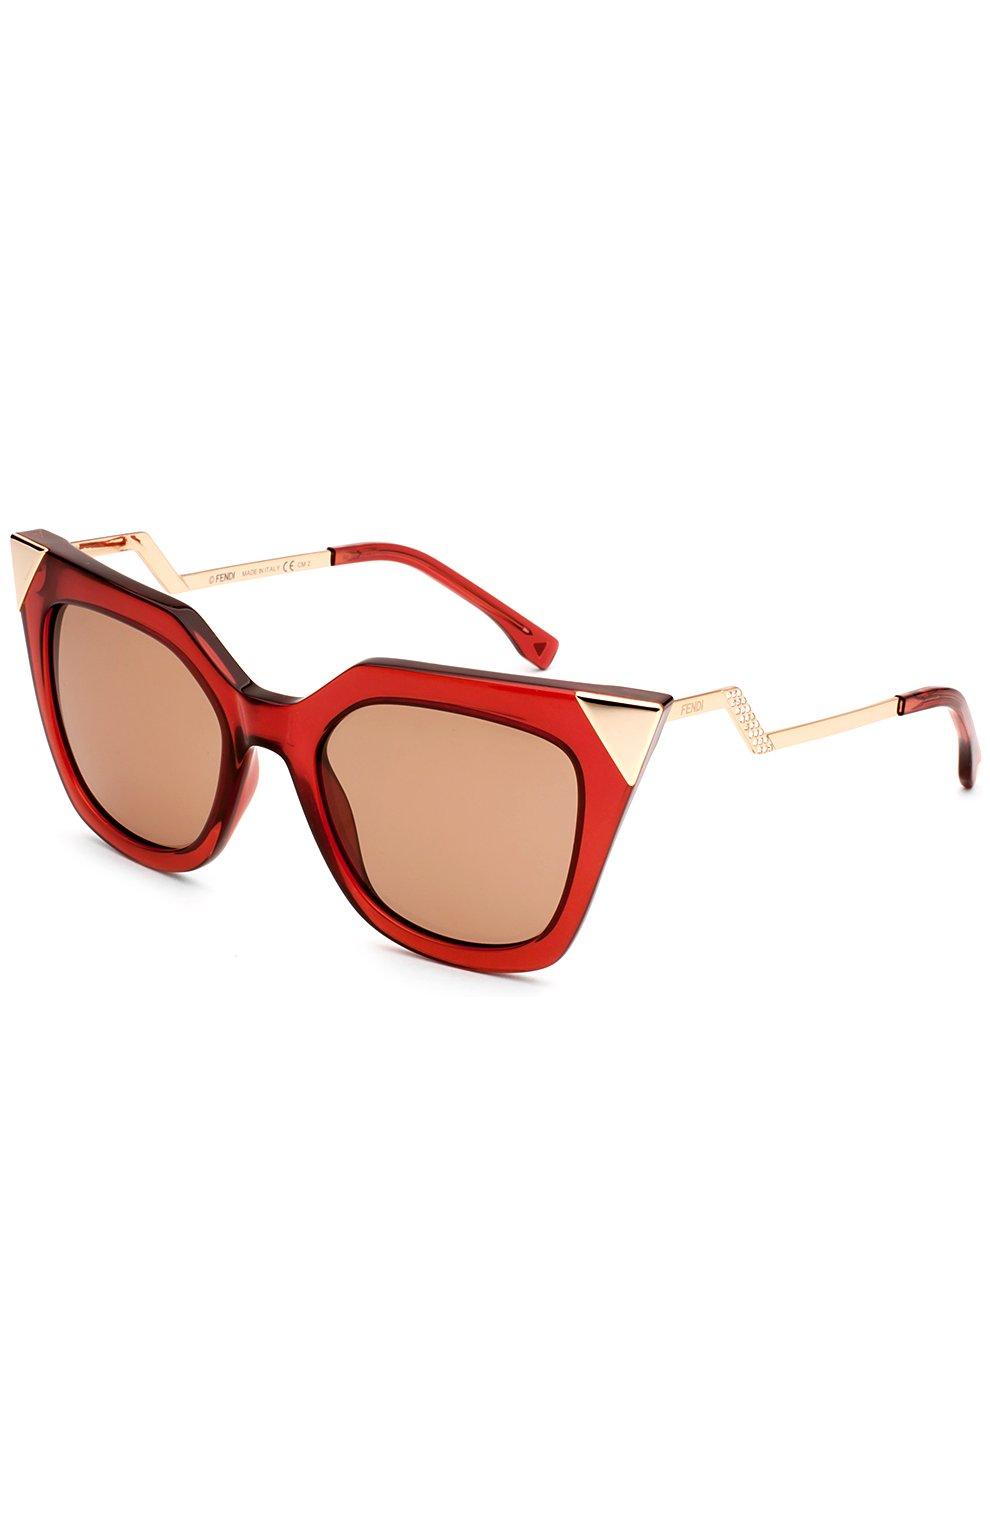 Женские солнцезащитные очки FENDI красного цвета, арт. 0060 N9M | Фото 2